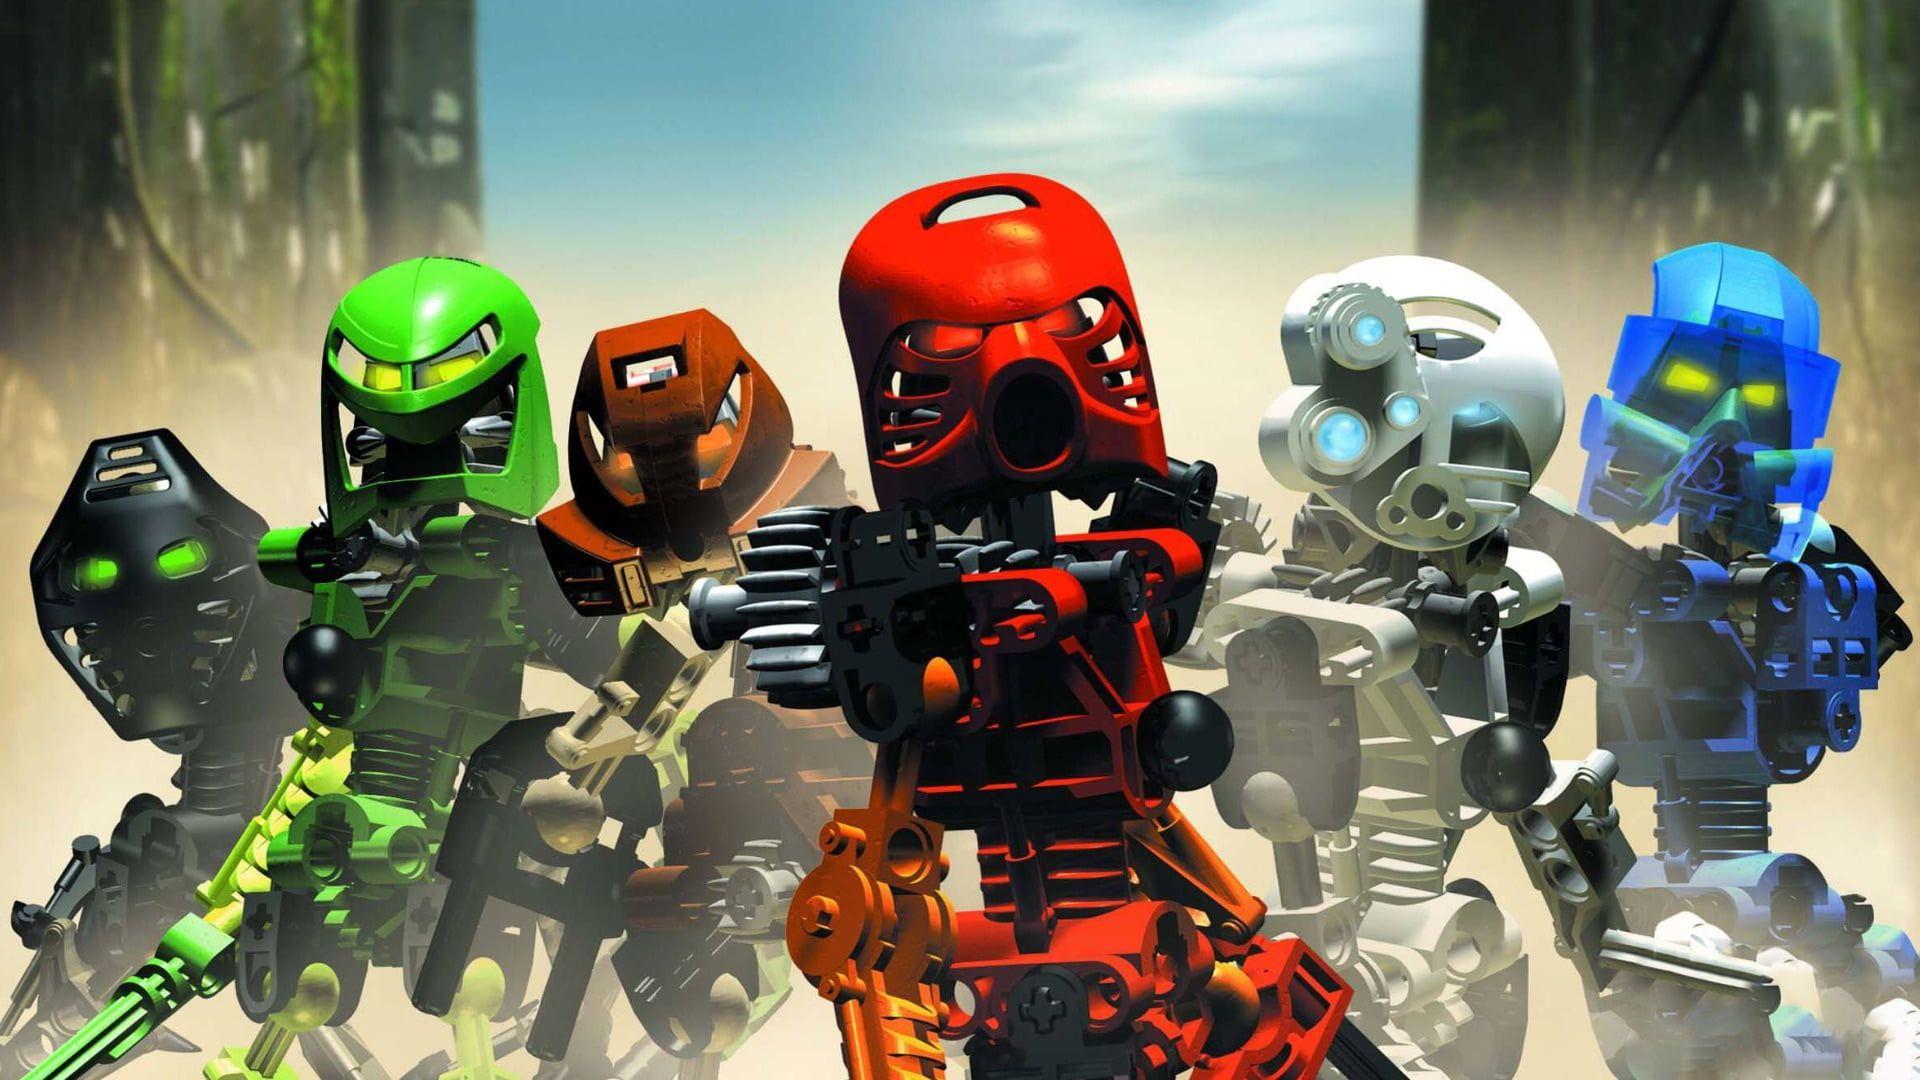 Bionicle Lego Toa Lego Technic Entertainment 1080p Wallpaper Hdwallpaper Desktop In 2020 Bionicle Character Sketch Lego Bionicle